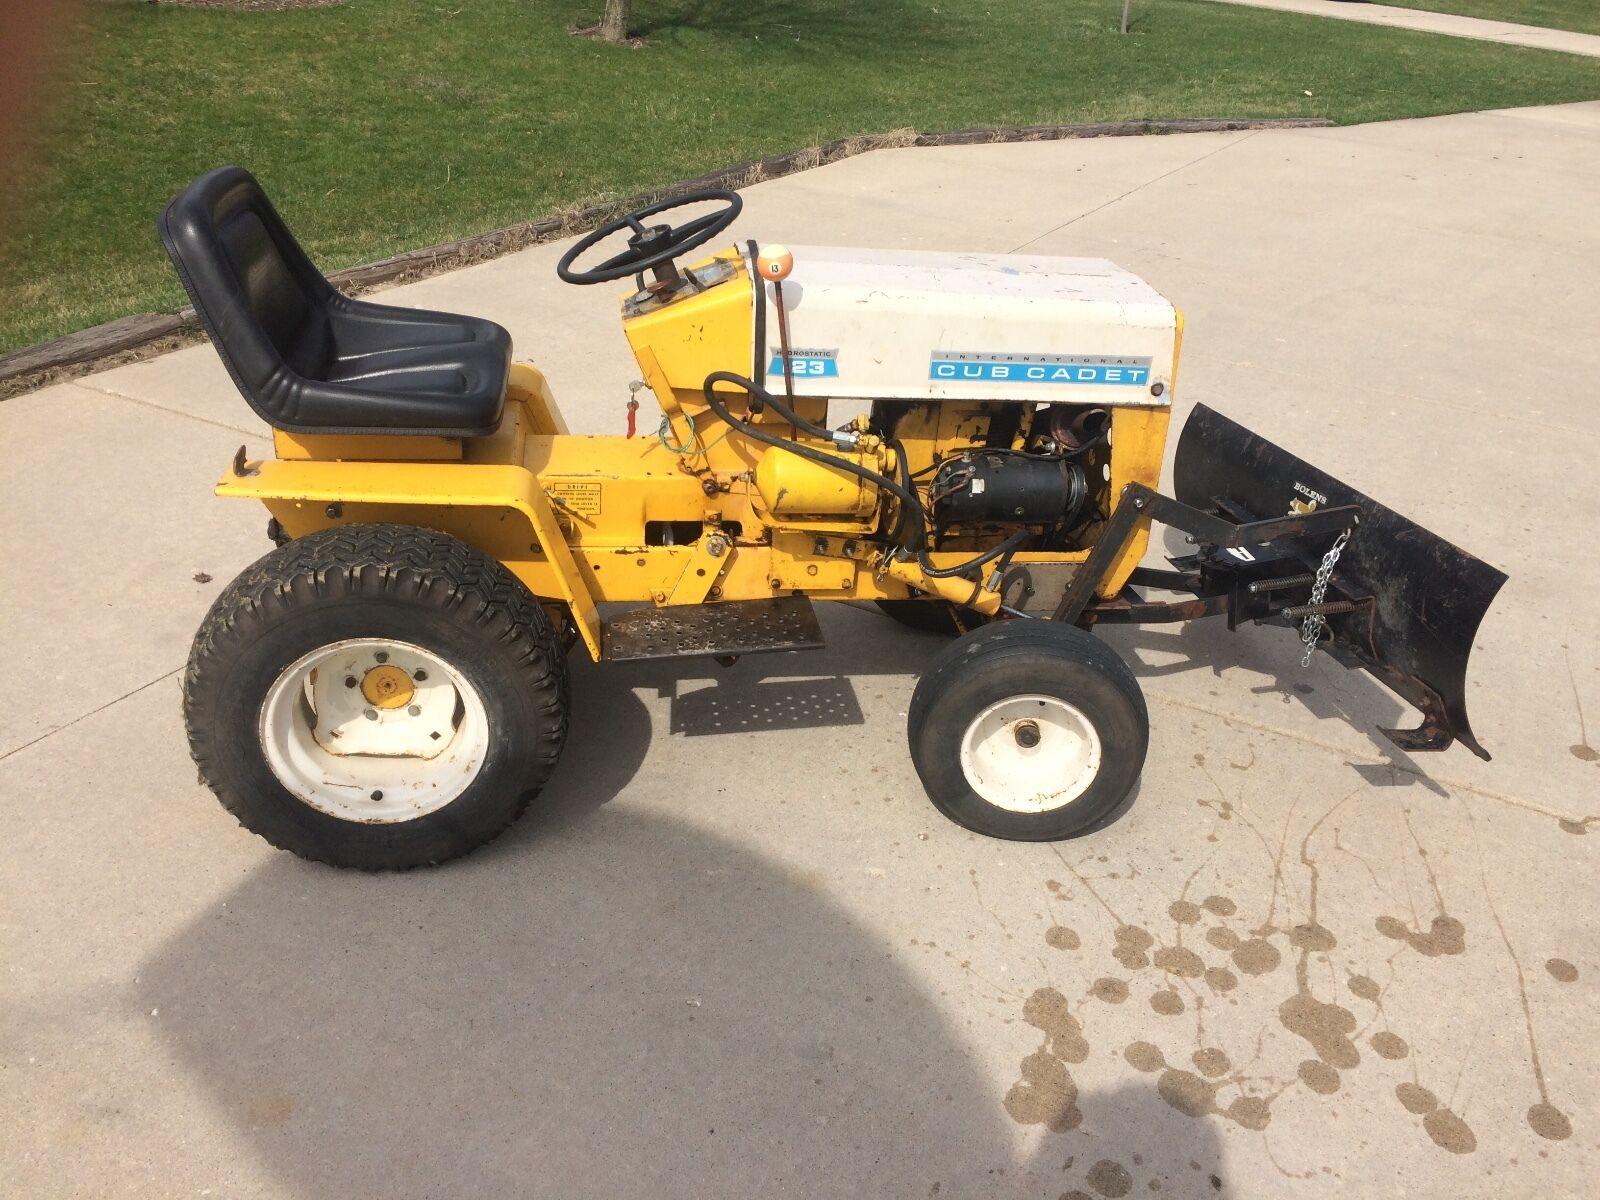 Cub Cadet 123 Garden Tractor